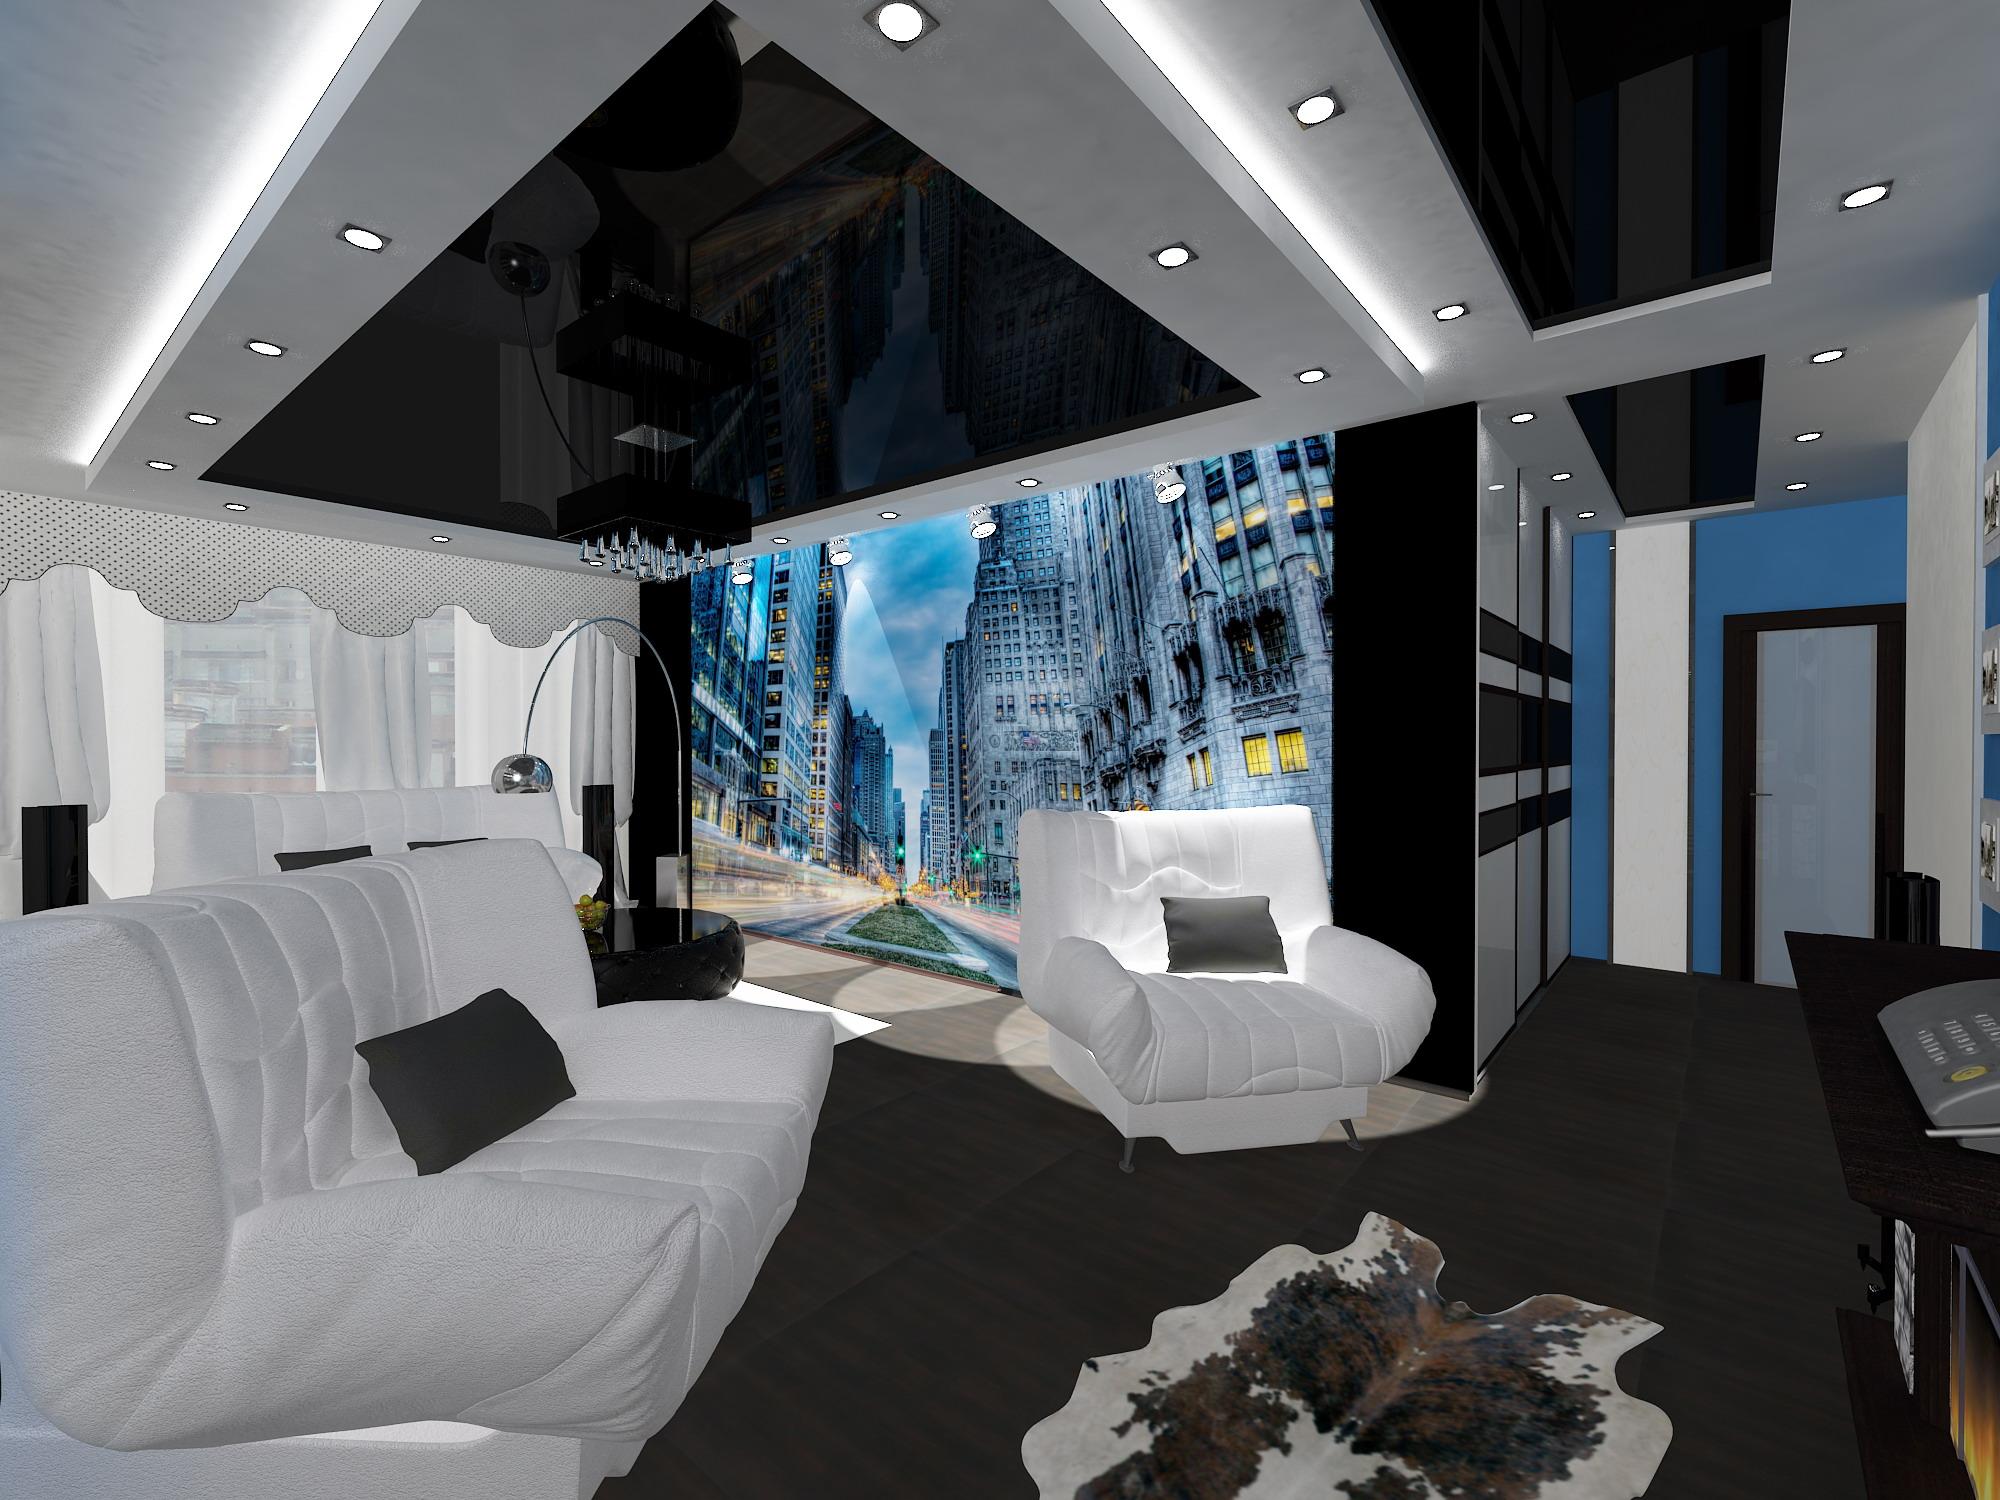 дизайна квартиры 60 кв. м 5